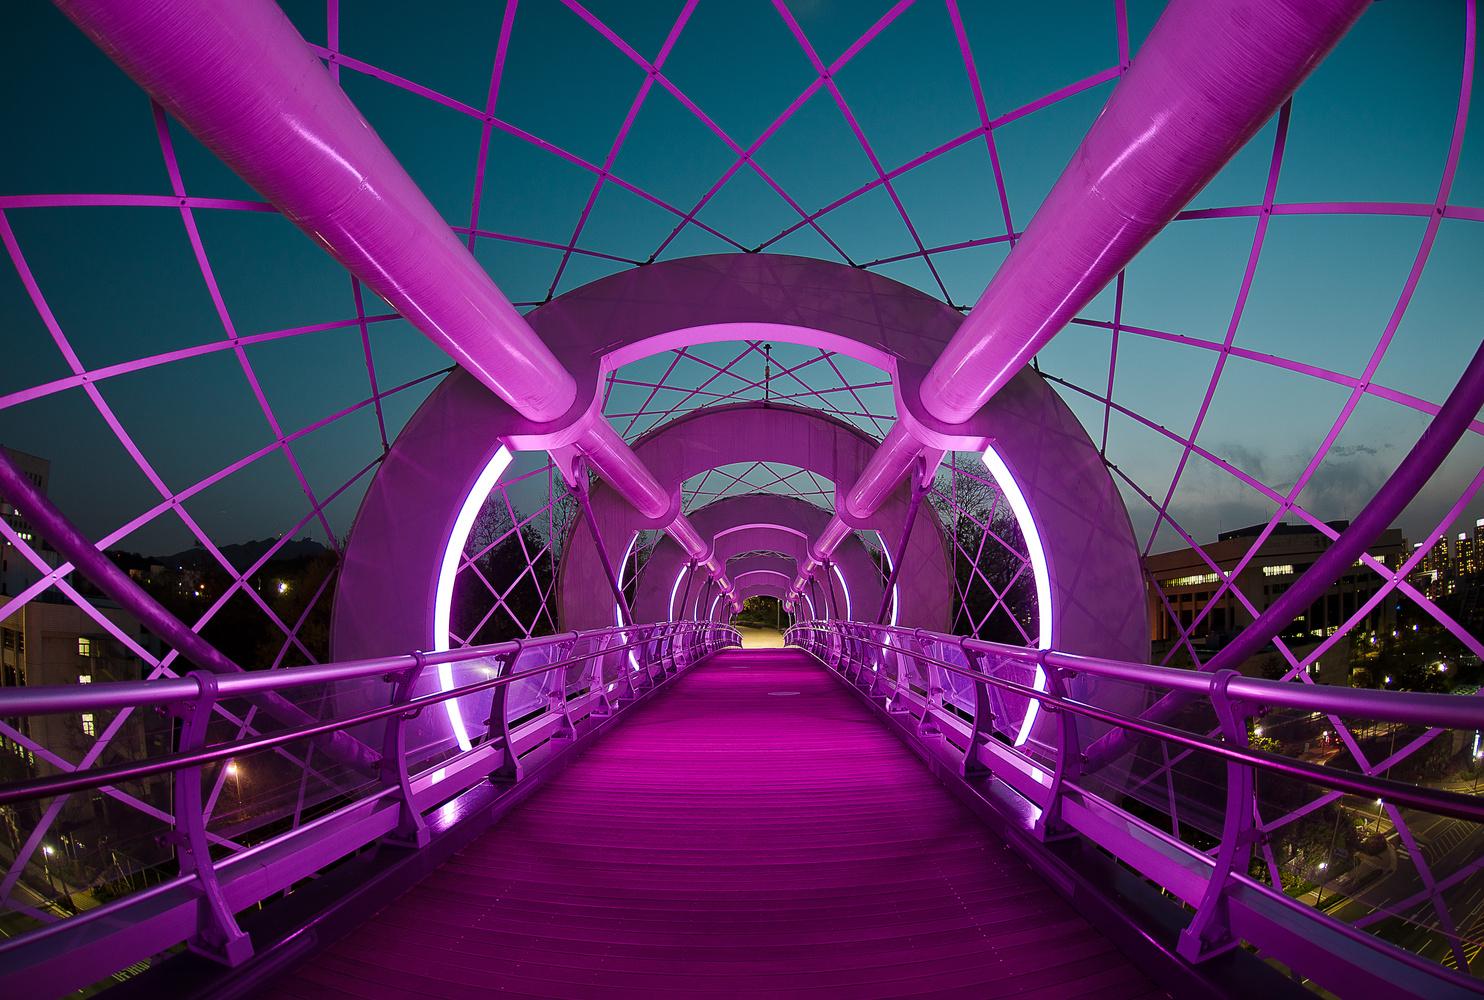 Silkworm Bridge by Justin Howard